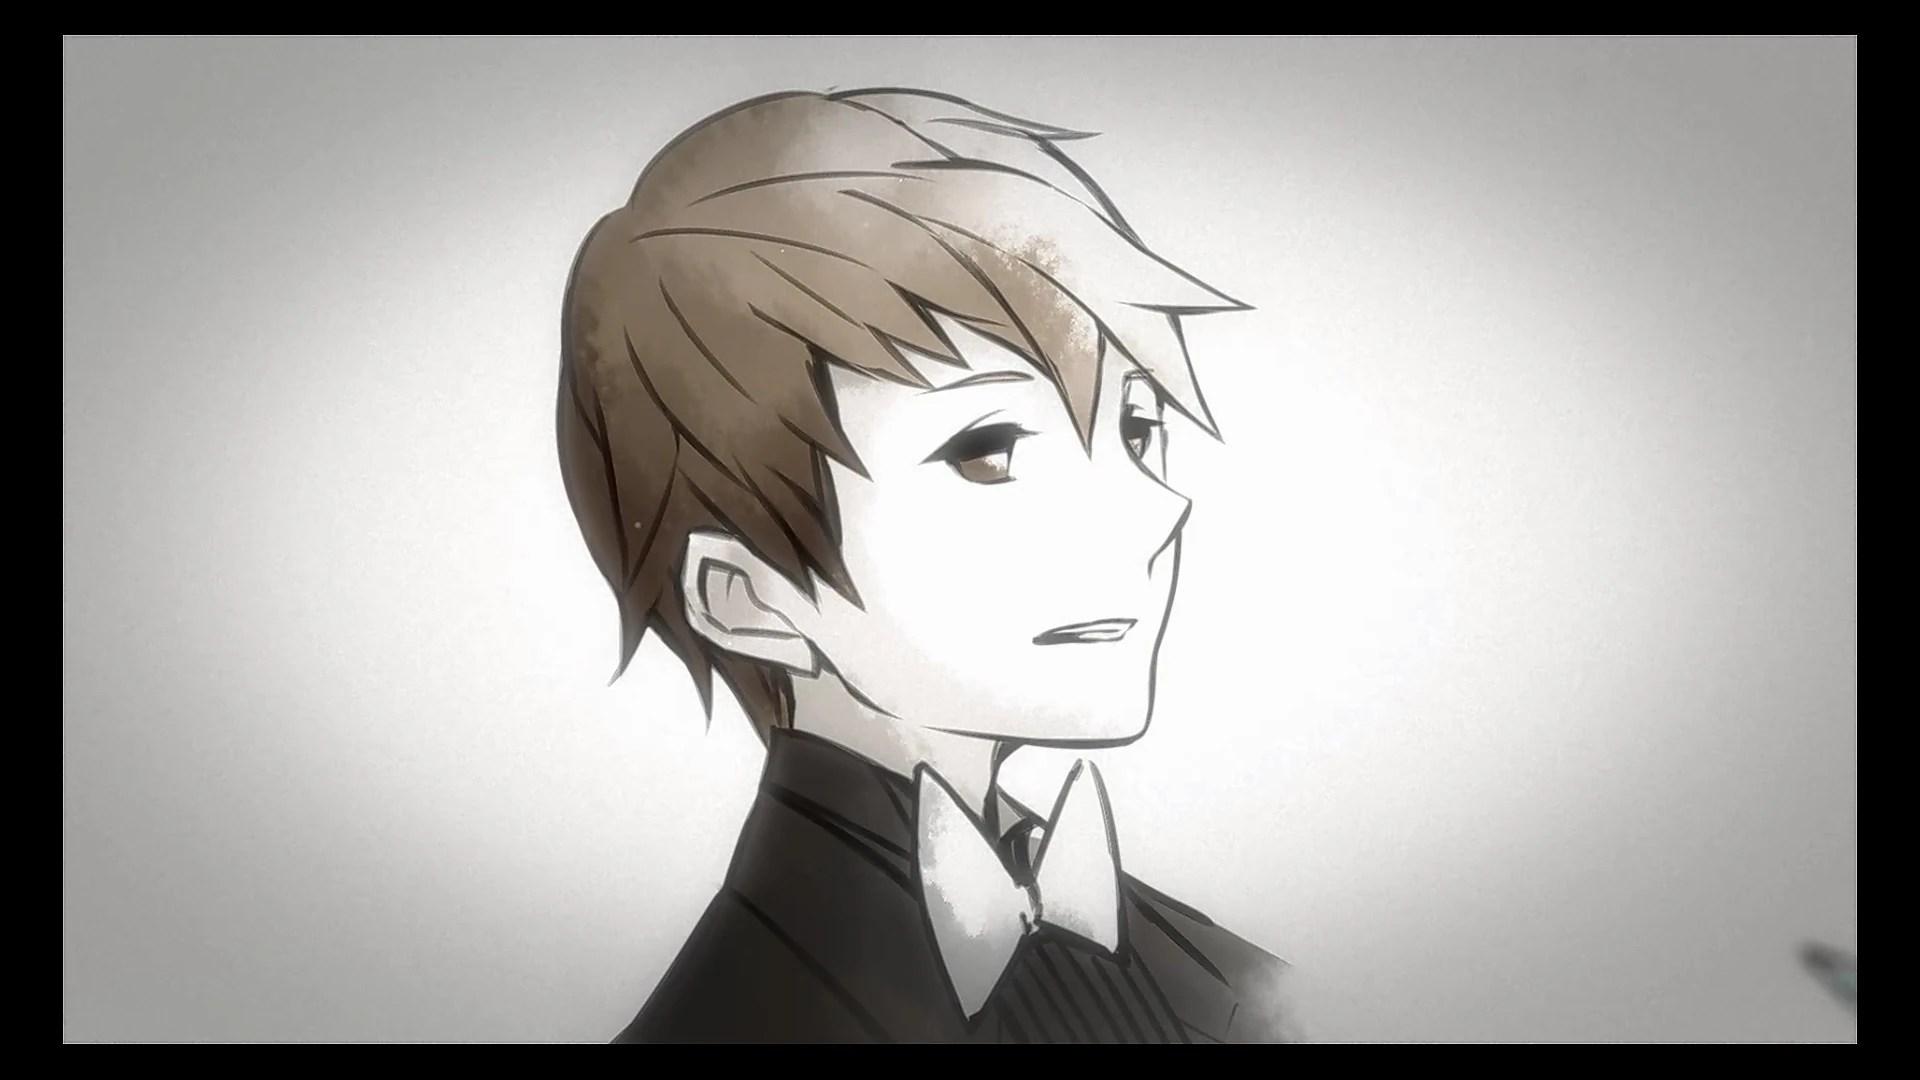 Sad Girl Sketch Wallpaper Deemo Character Deemo Wiki Fandom Powered By Wikia